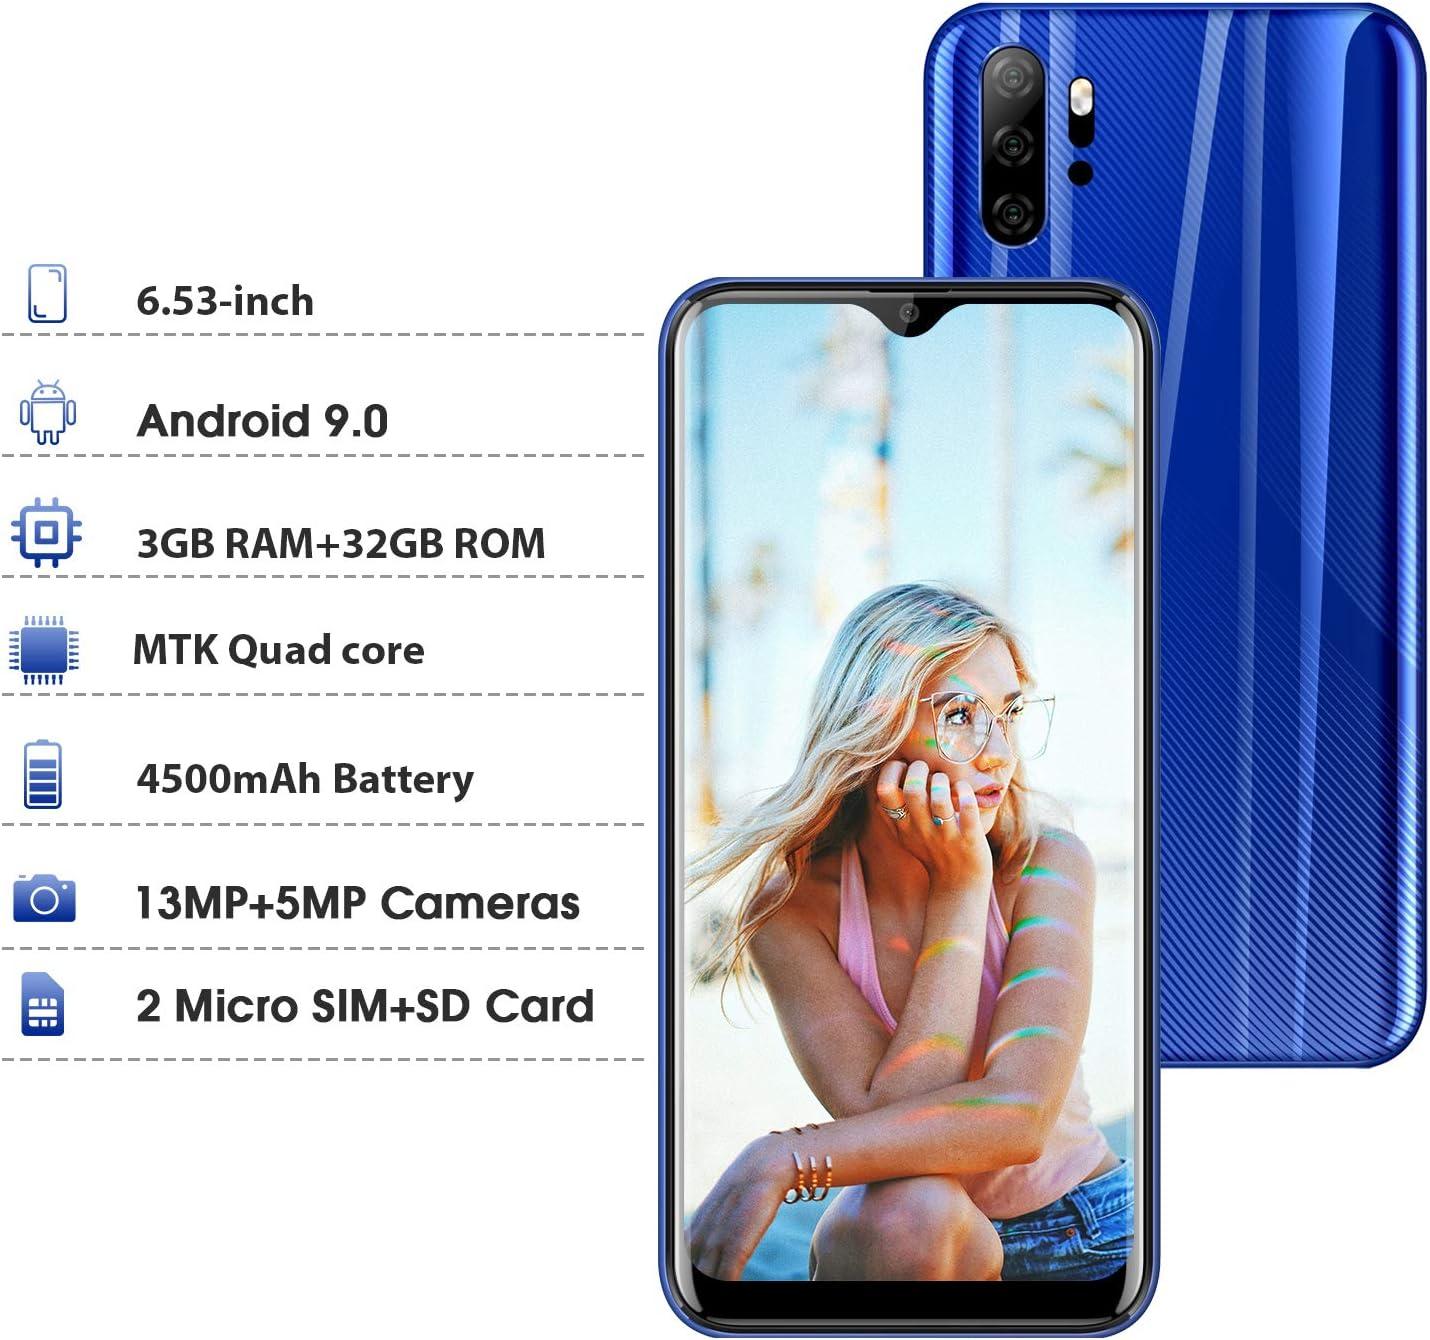 Moviles Libres 4g, Smartphone Libre Dual SIM 6.53 Pulgadas P30 Plus(2020) 3GB+32GB/128GB 4300mAh Full-Screen Android 9.0 Quad Core Cámara 13MP+5MP Moviles Buenos (Azul): Amazon.es: Electrónica